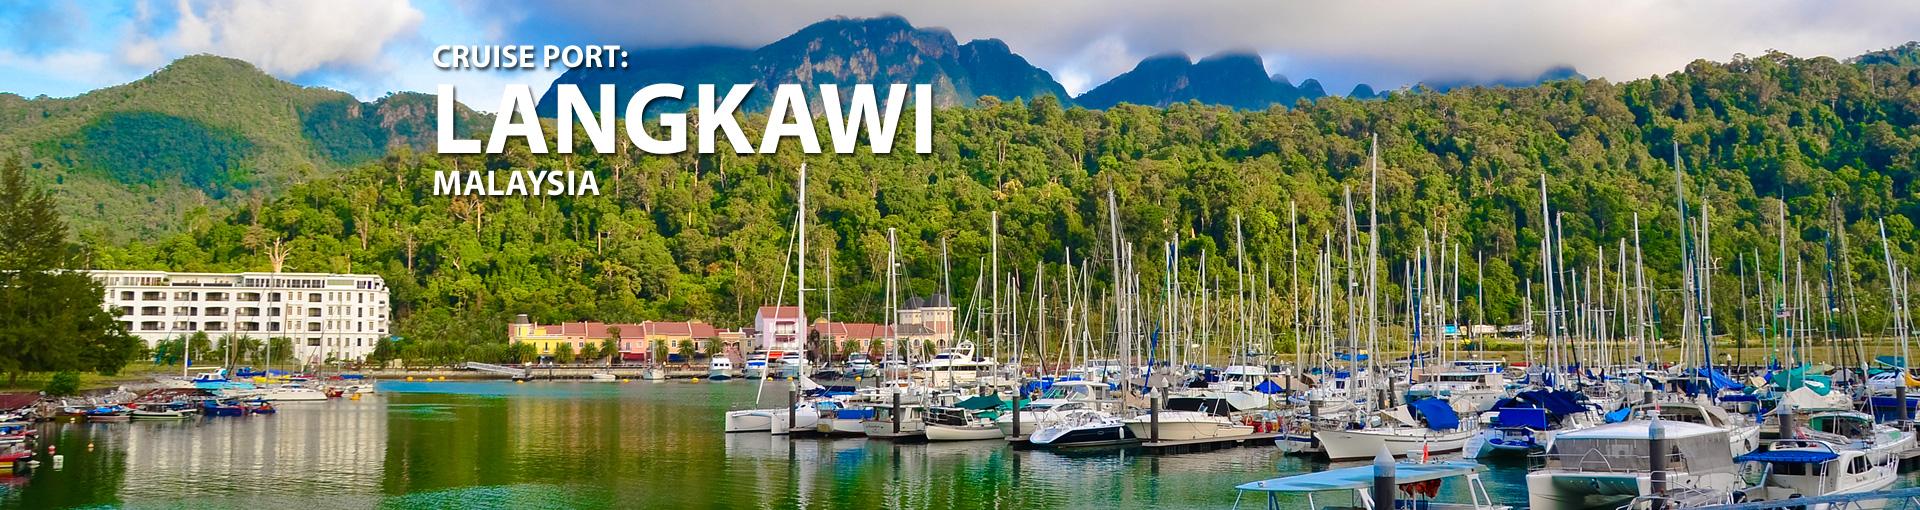 Cruise Port: Langkawi, Malaysia